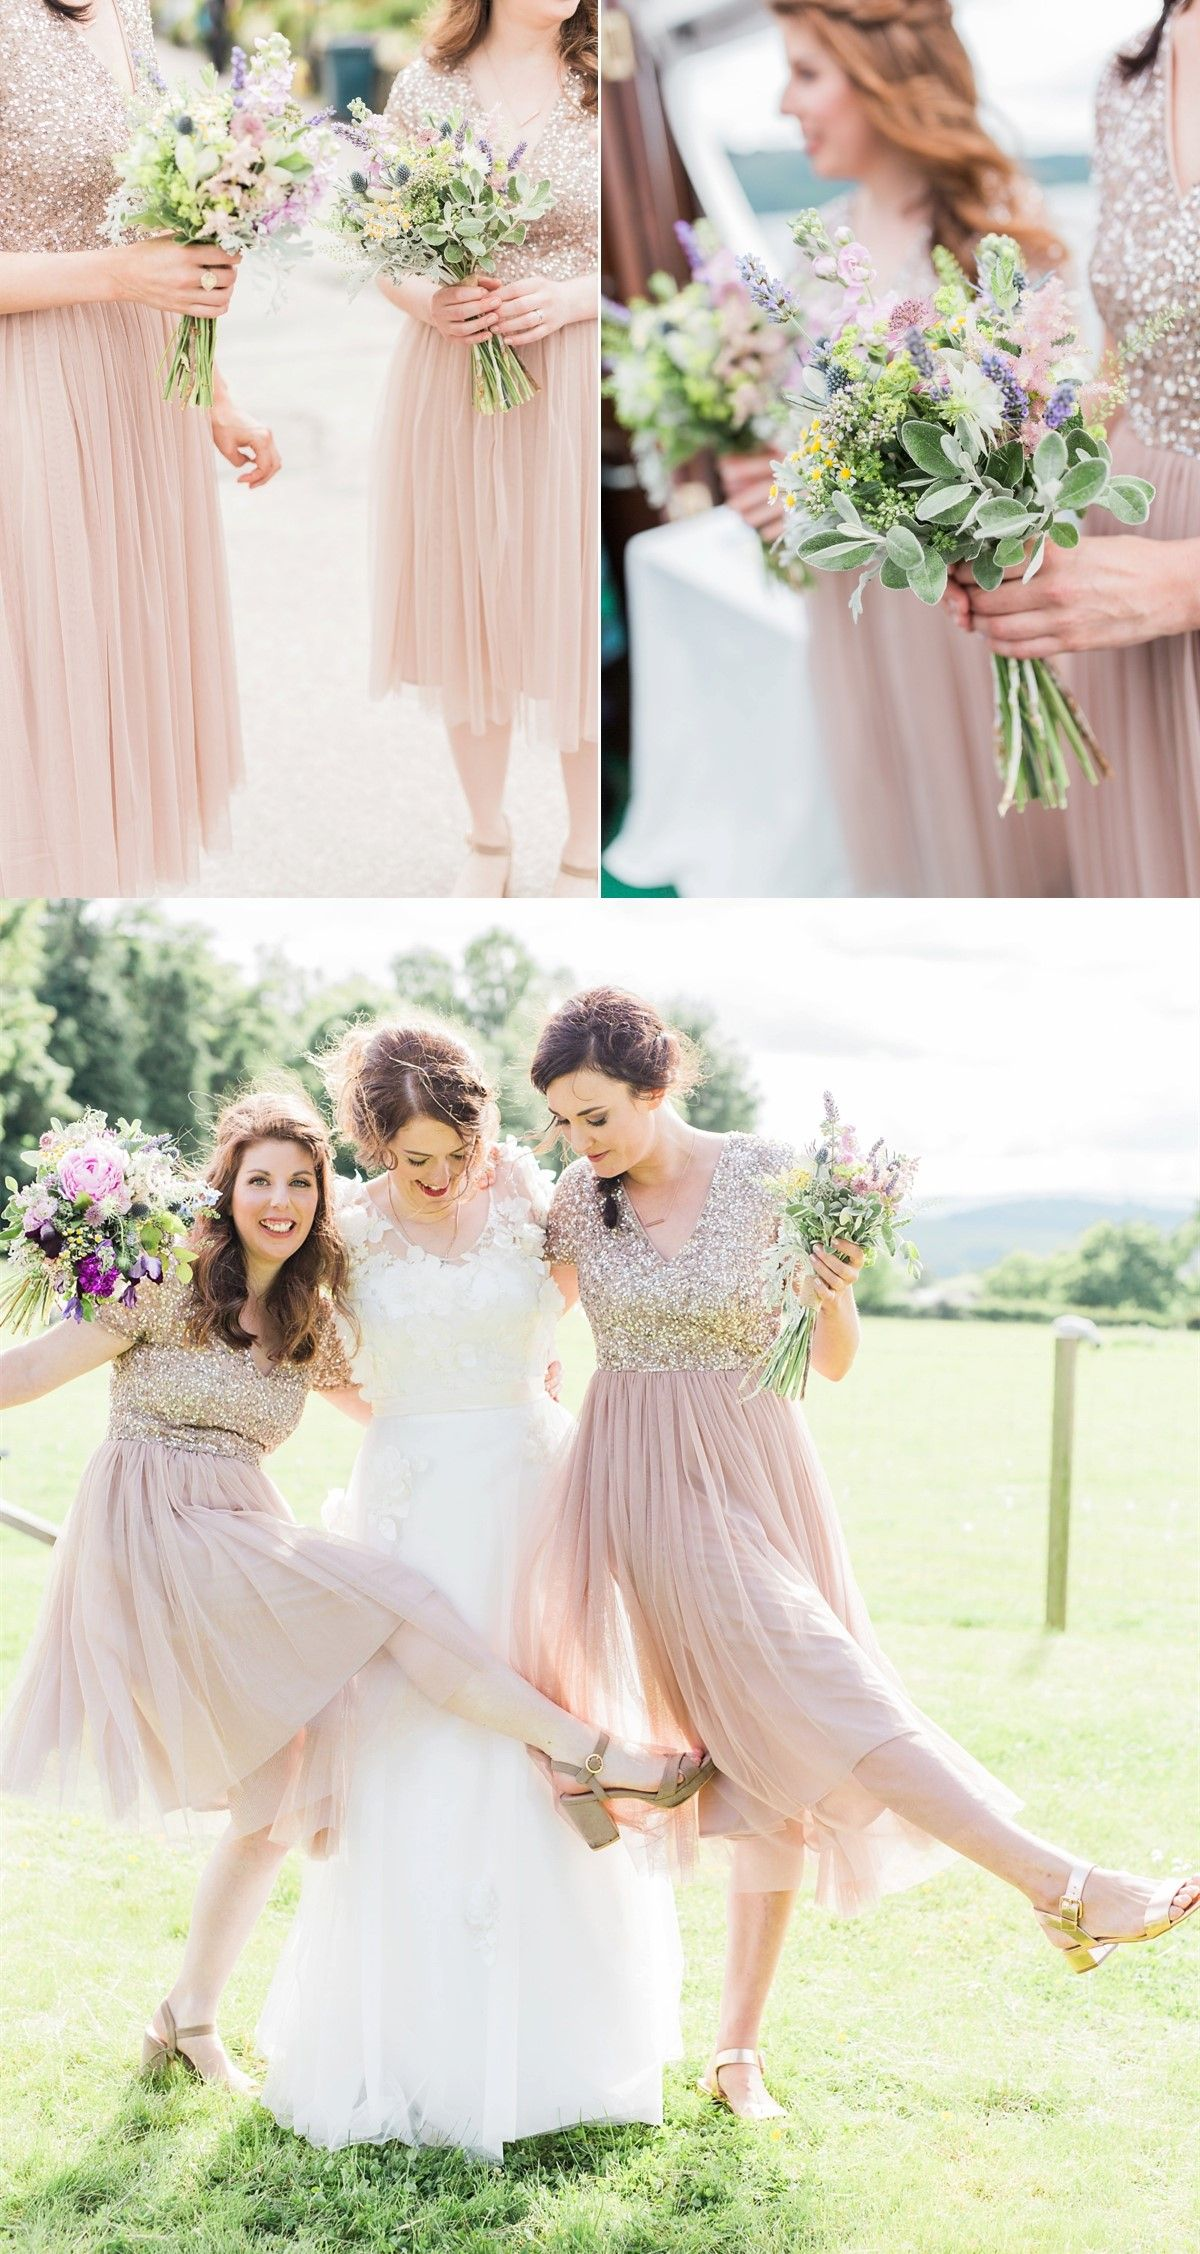 30cbb0ef95f1 Pink Bridesmaid Dress with Short Sleeves, Elegant Bridesmaid Dresses with  Sequin, Short Prom Party Dresses #wedding #prom